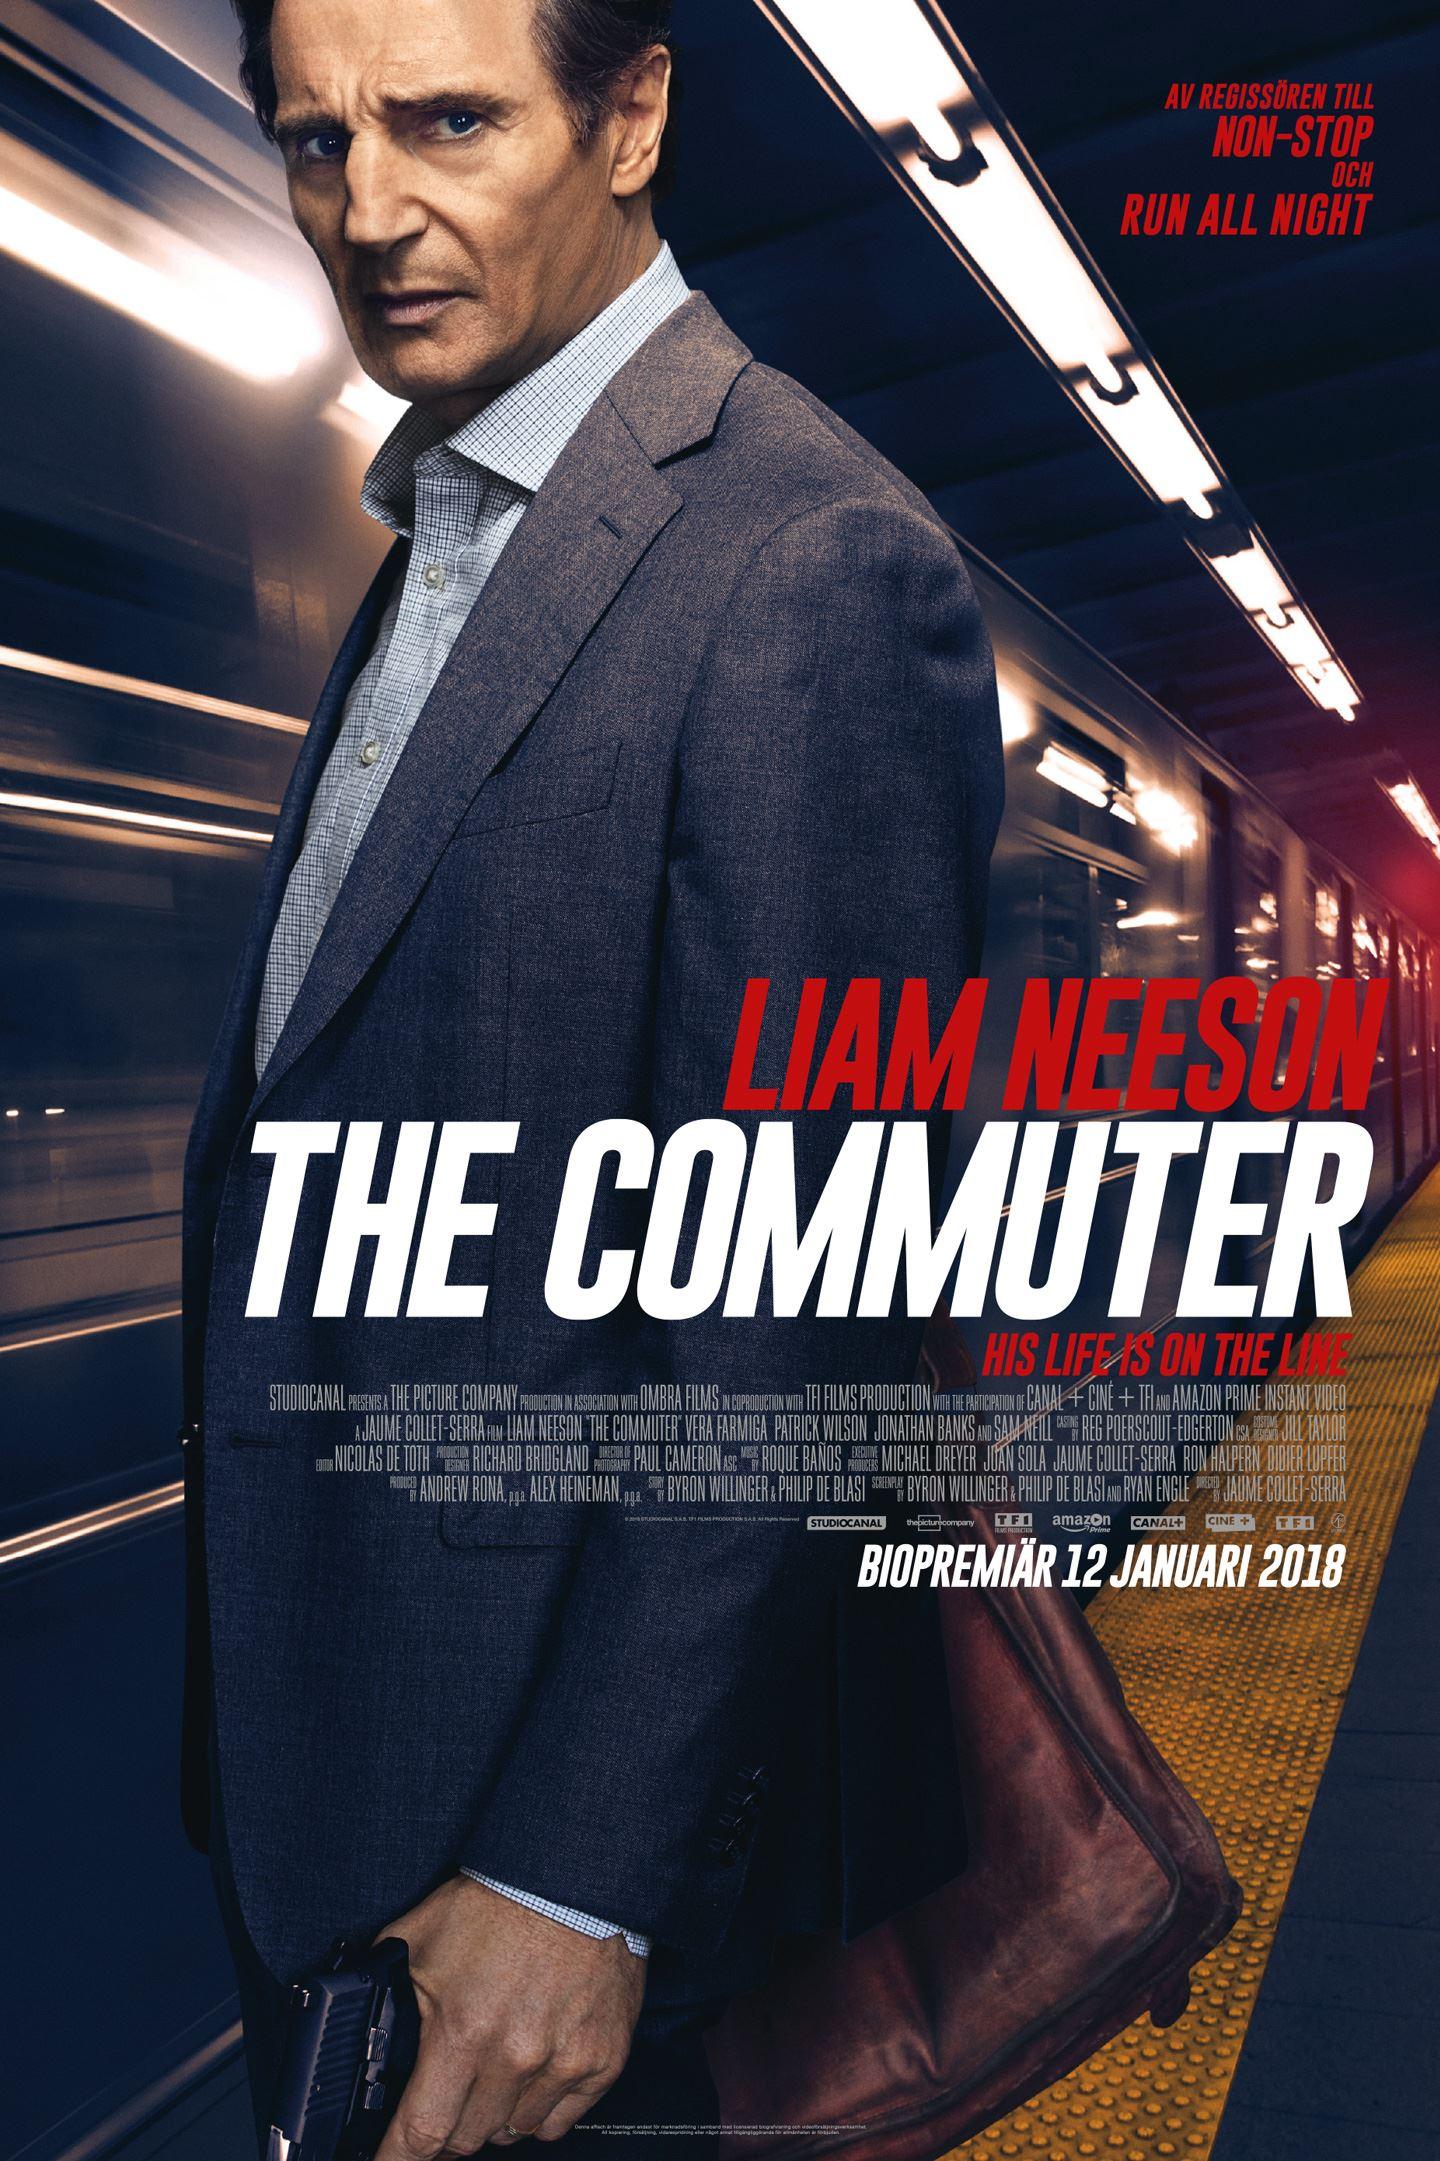 Bio: The Commuter